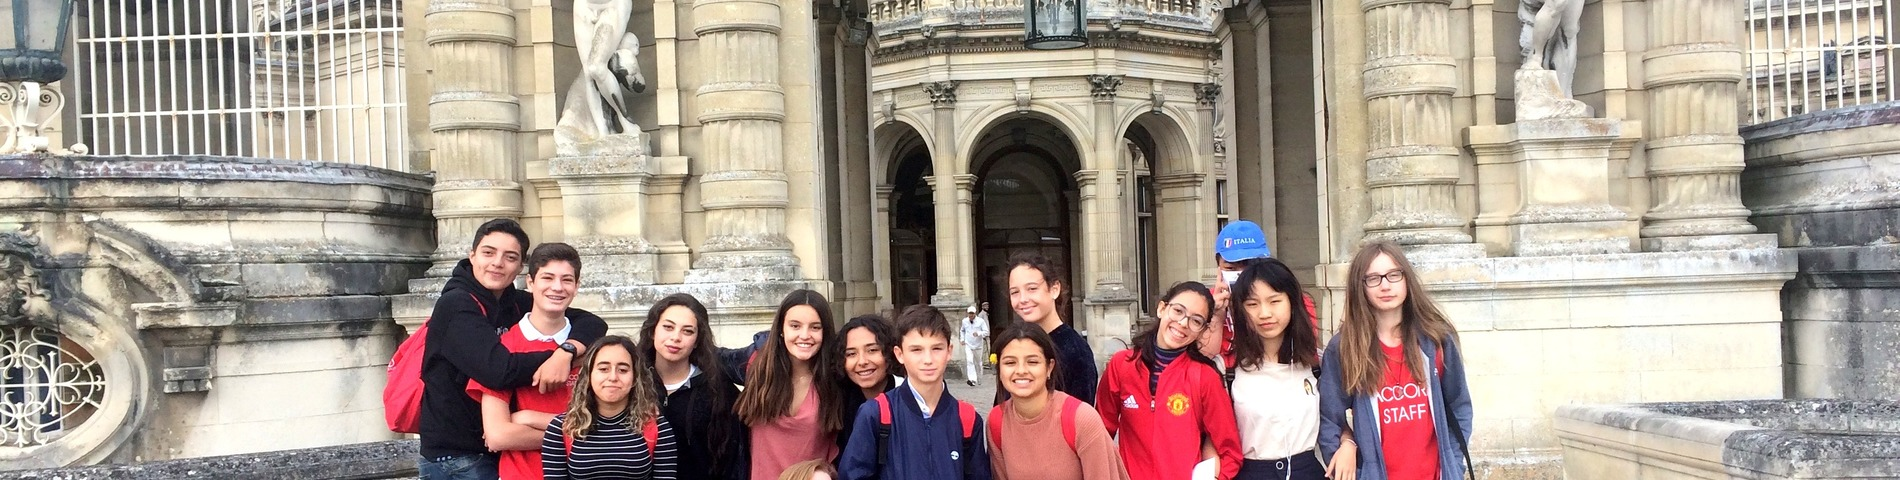 Accord French Language School Bild 1